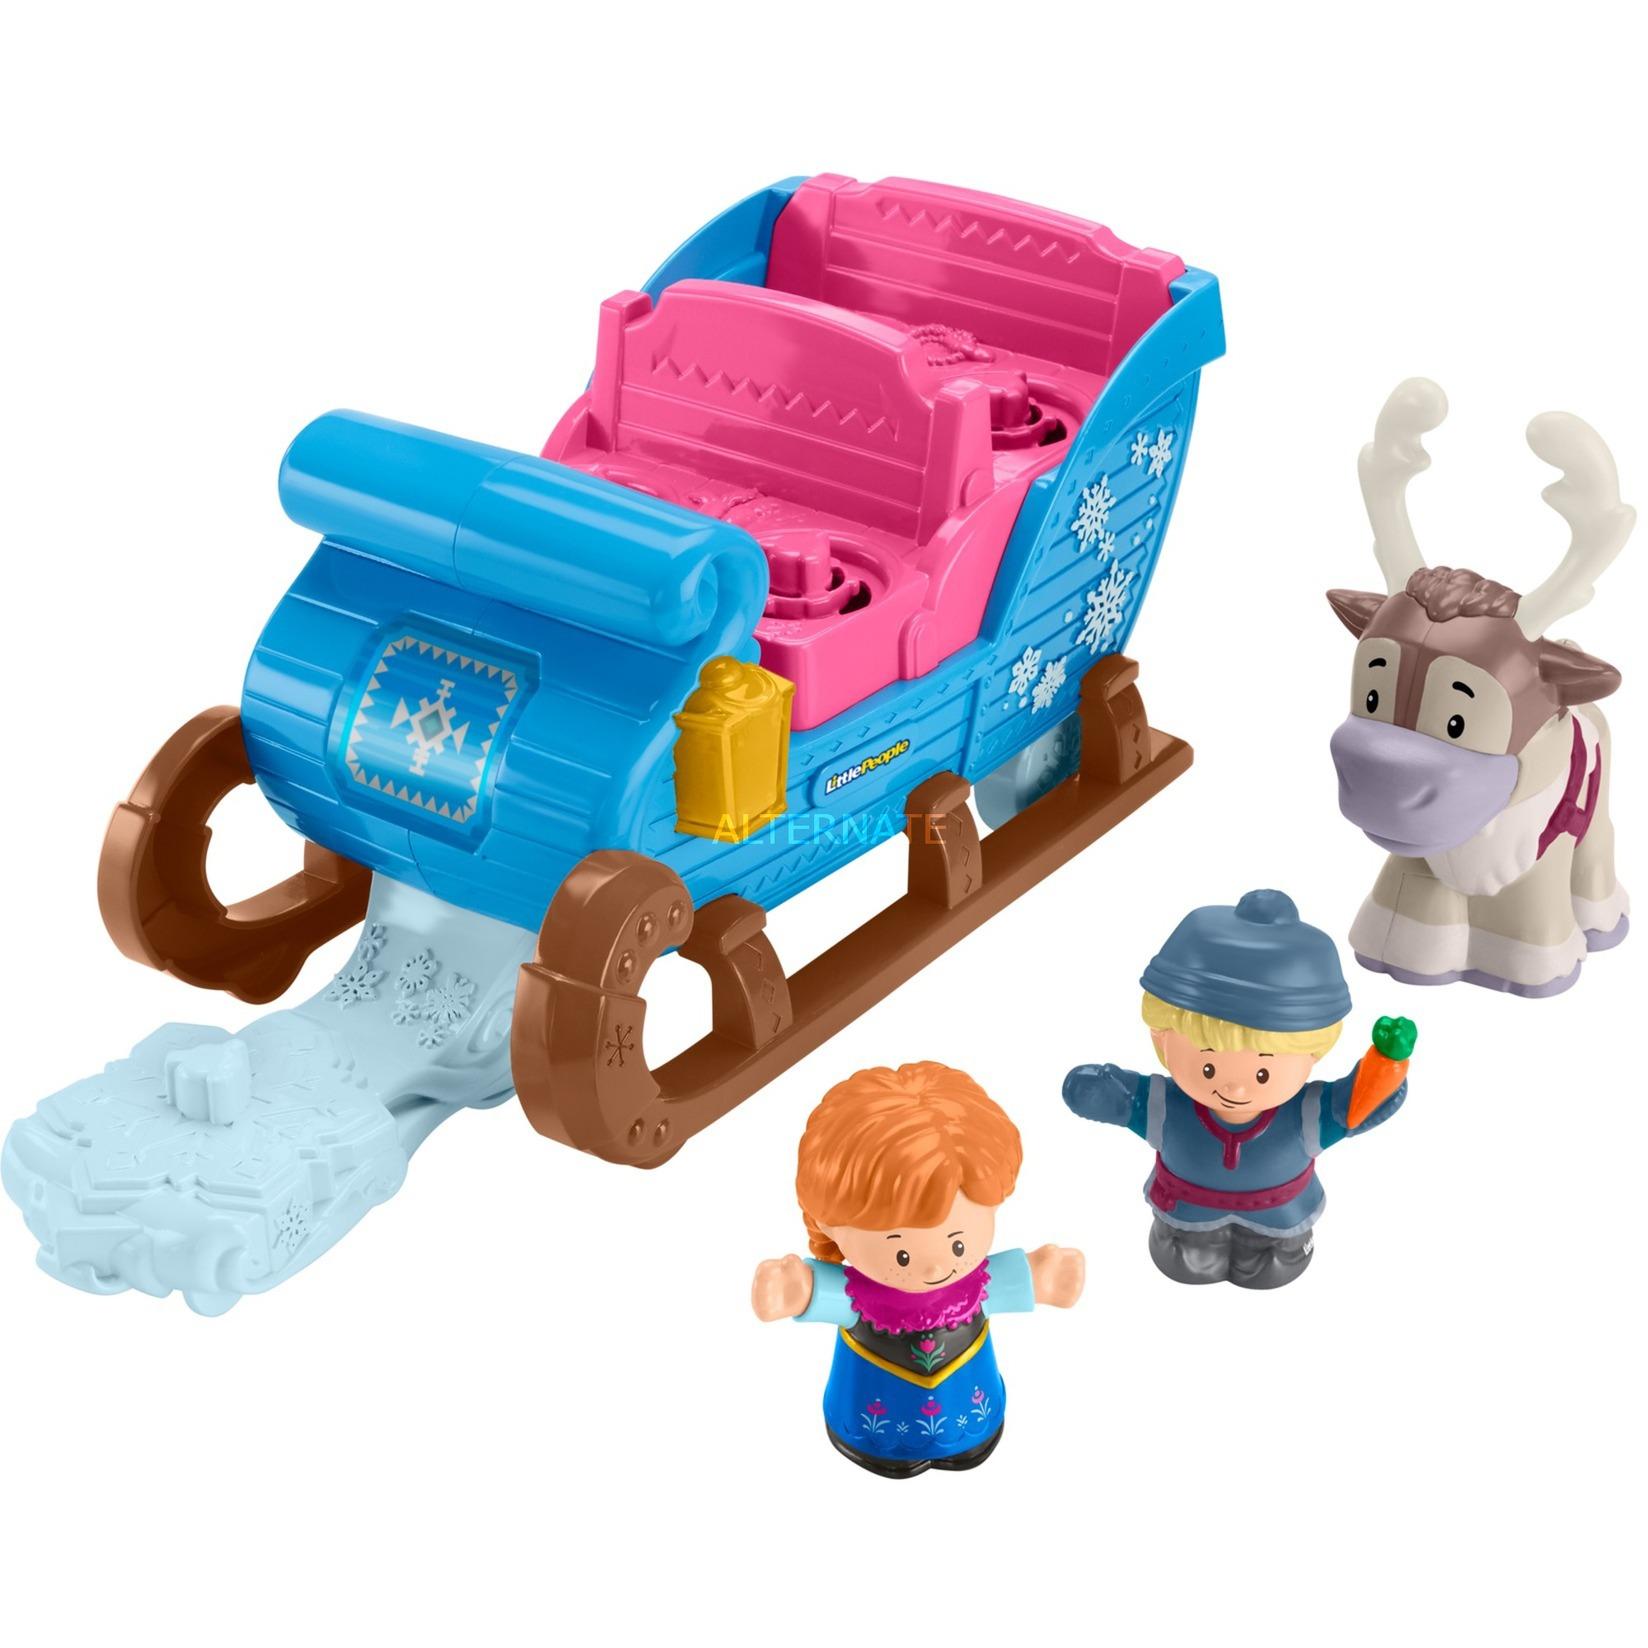 GGV30 kit de figura de juguete para niños, Muñecos